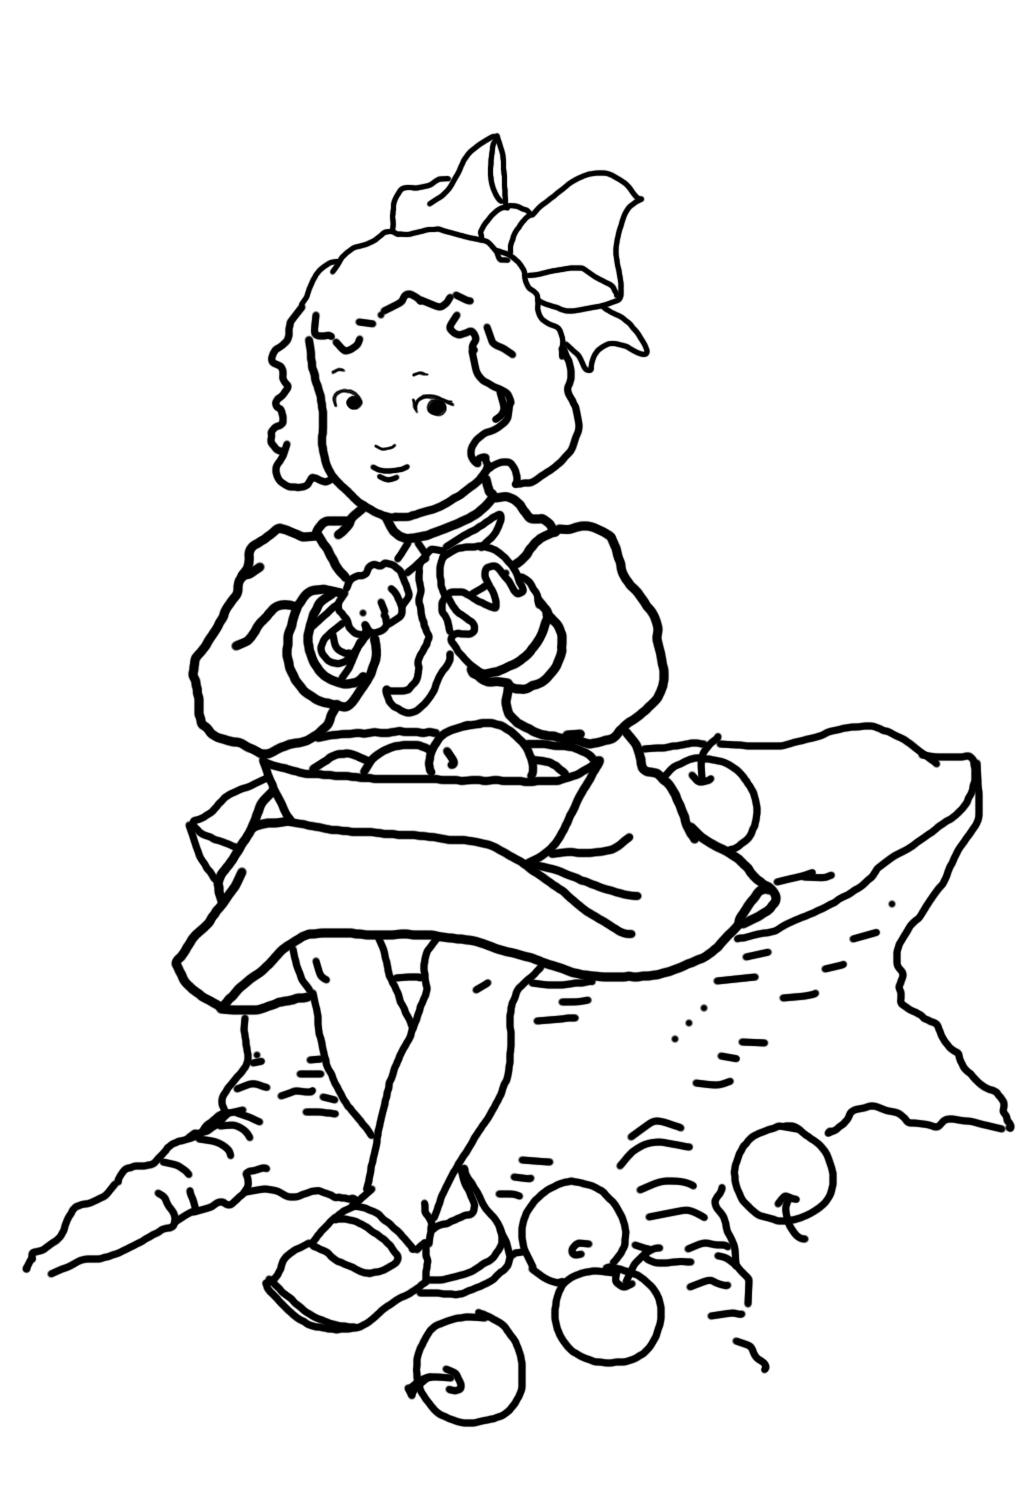 Coloring sheet girl peeling apples